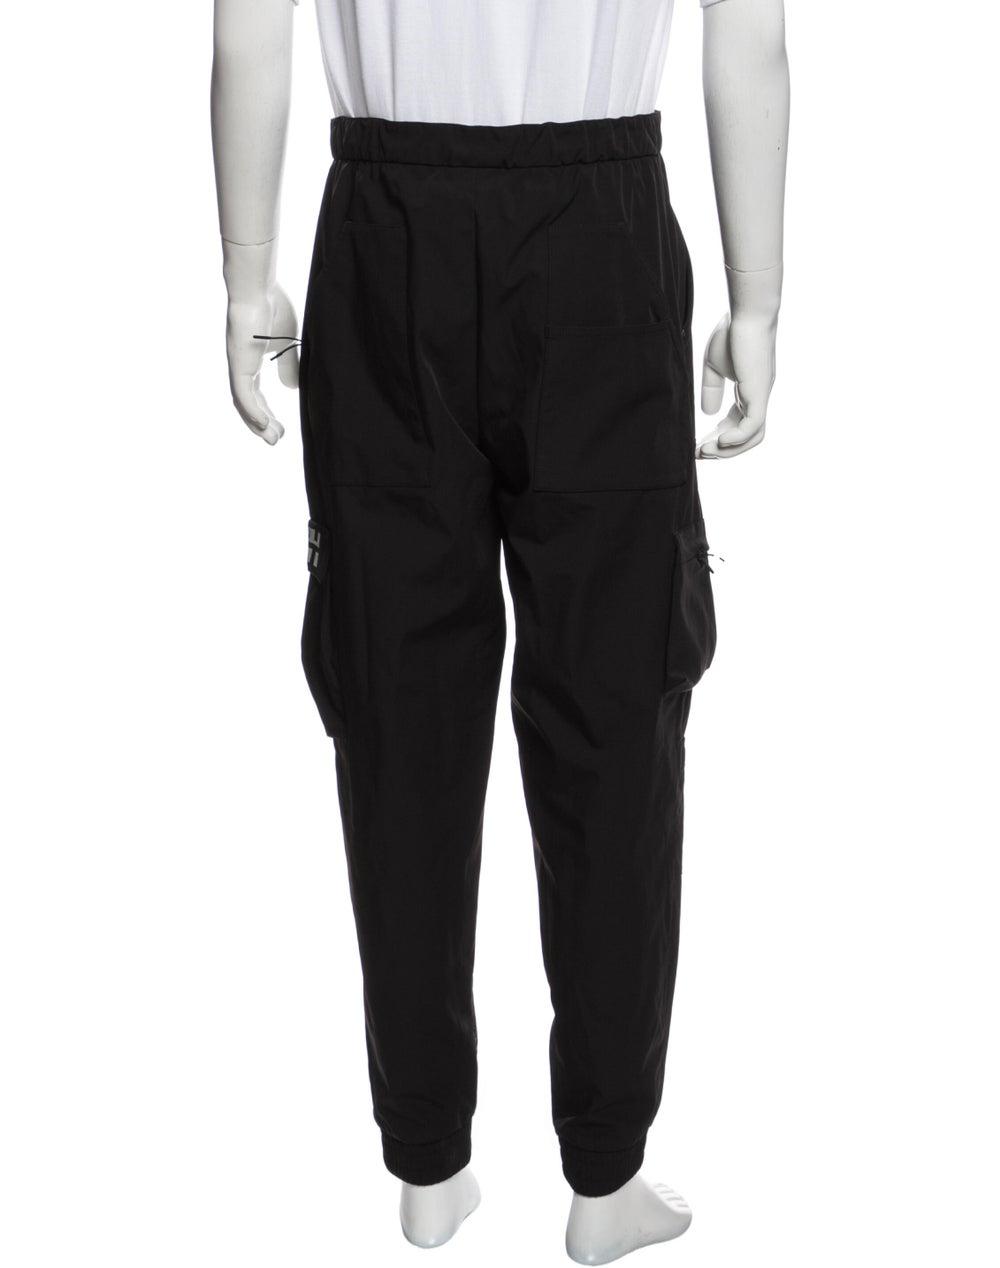 Kith Graphic Print Cargo Pants Black - image 3